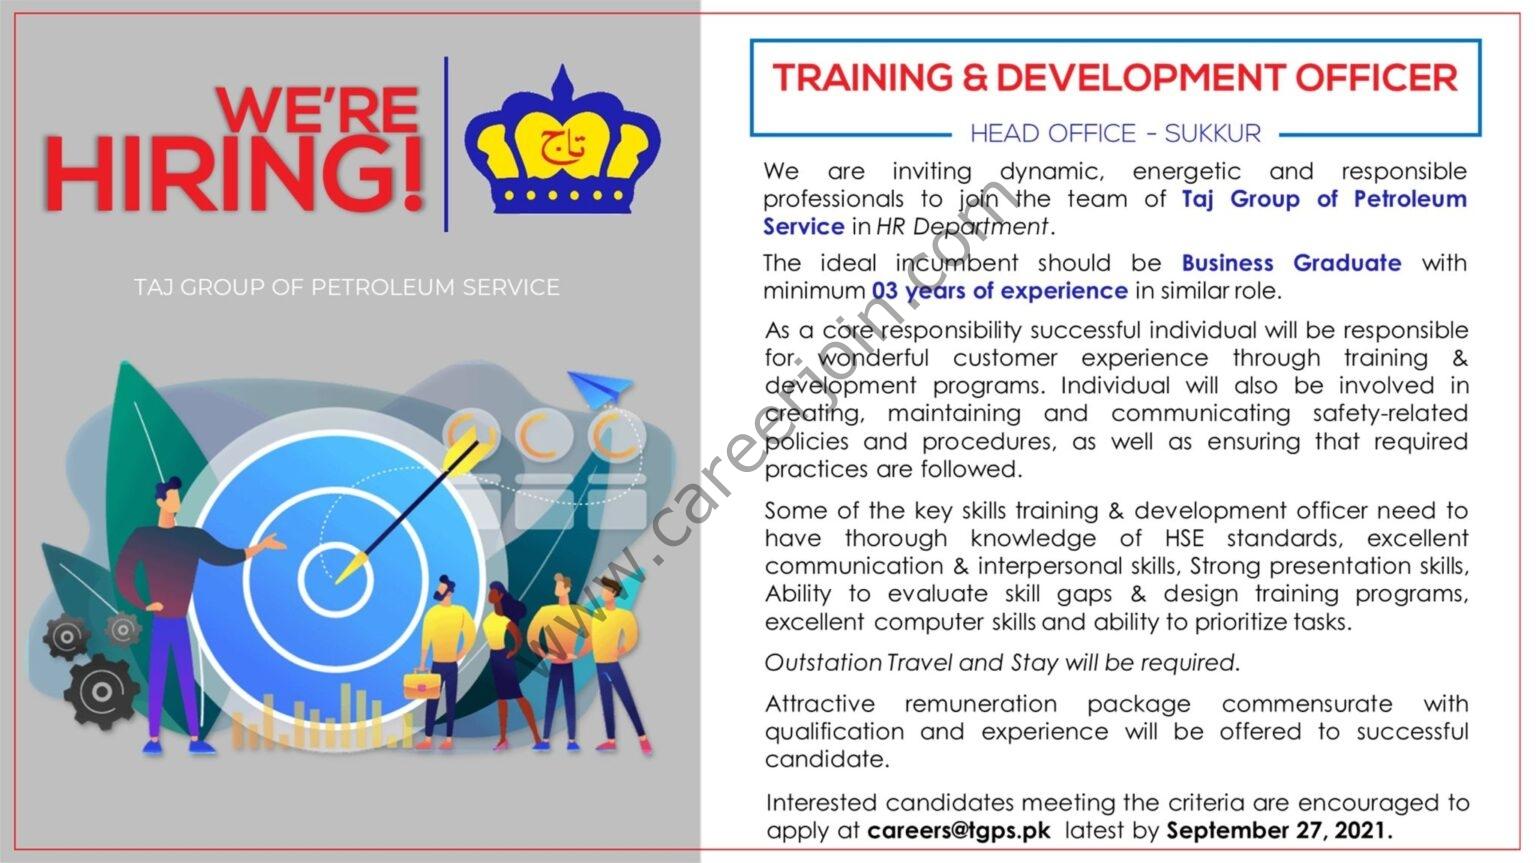 Taj Group Of Petroleum Service TGPS Jobs Training & Development Officer